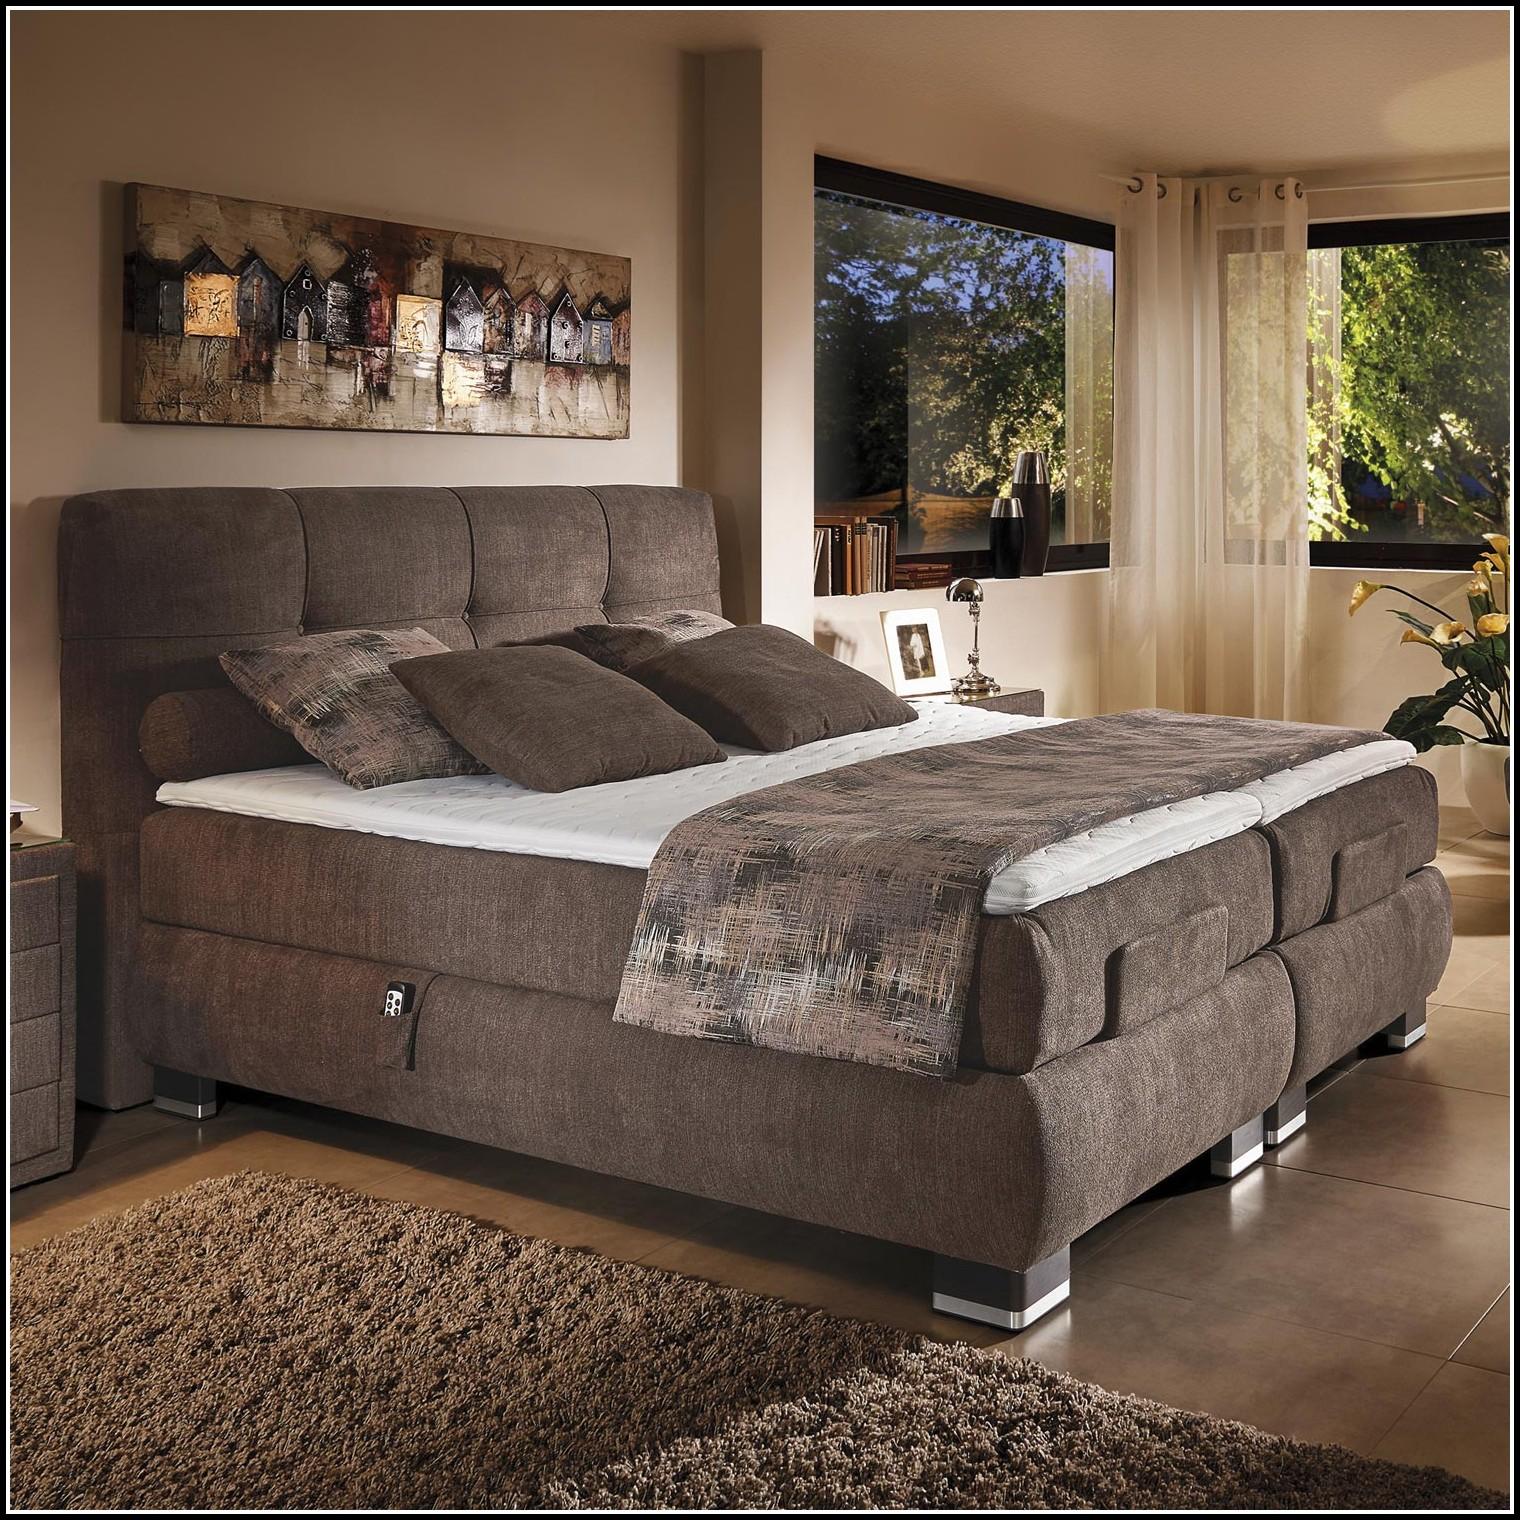 ruf betten boxspring mit motor betten house und dekor galerie qa1v3o6rbx. Black Bedroom Furniture Sets. Home Design Ideas